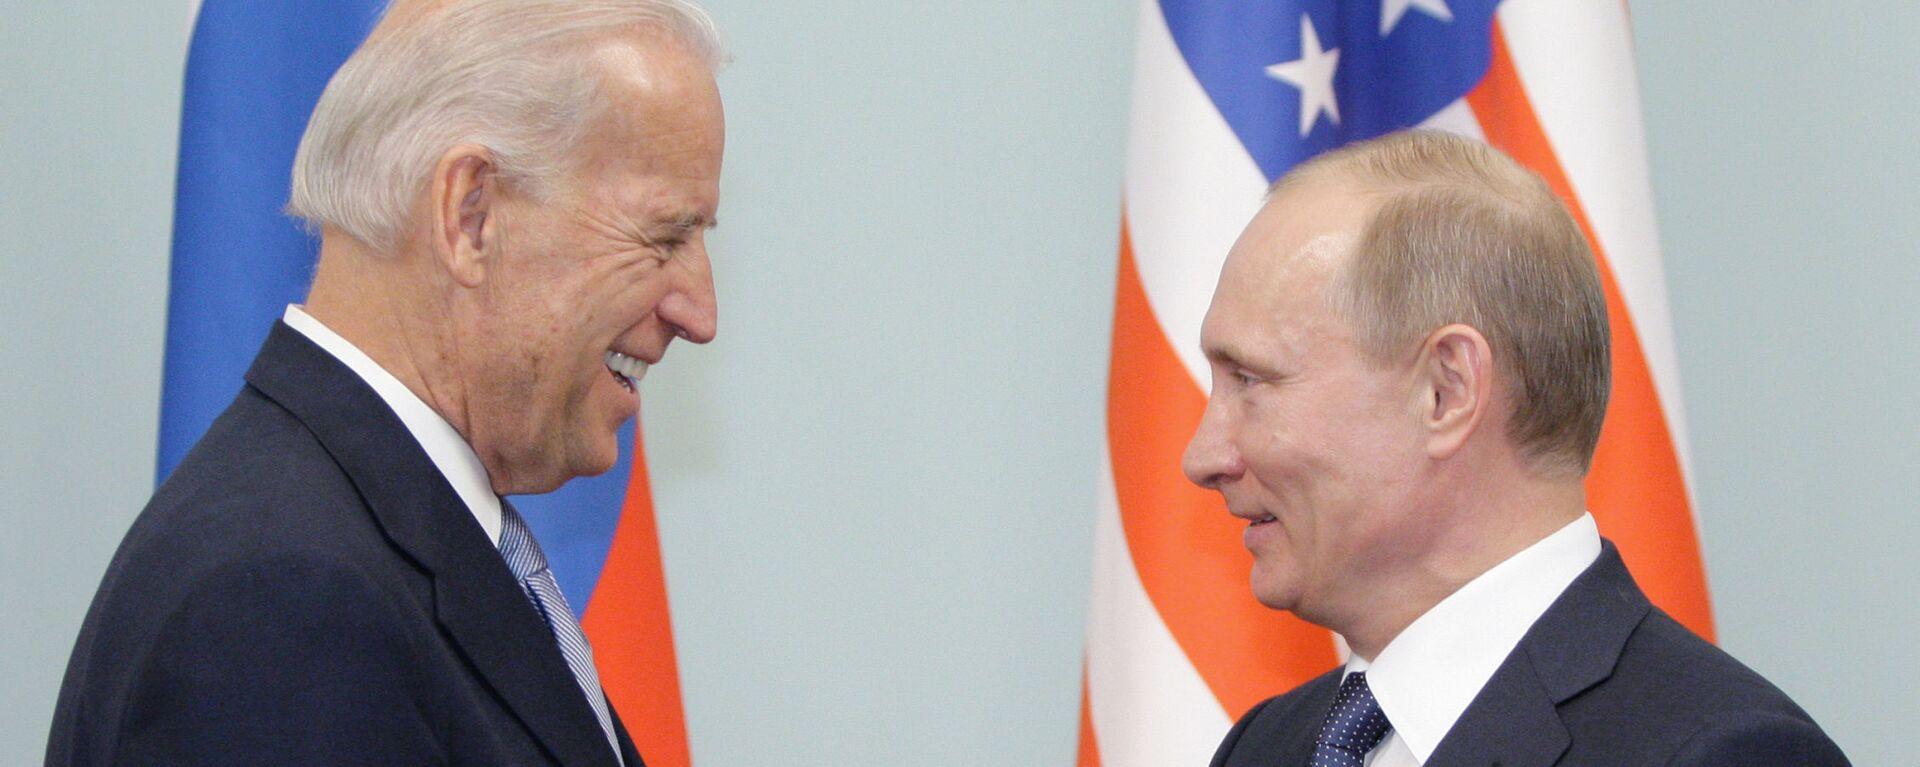 Biden e Putin - Sputnik Italia, 1920, 23.05.2021